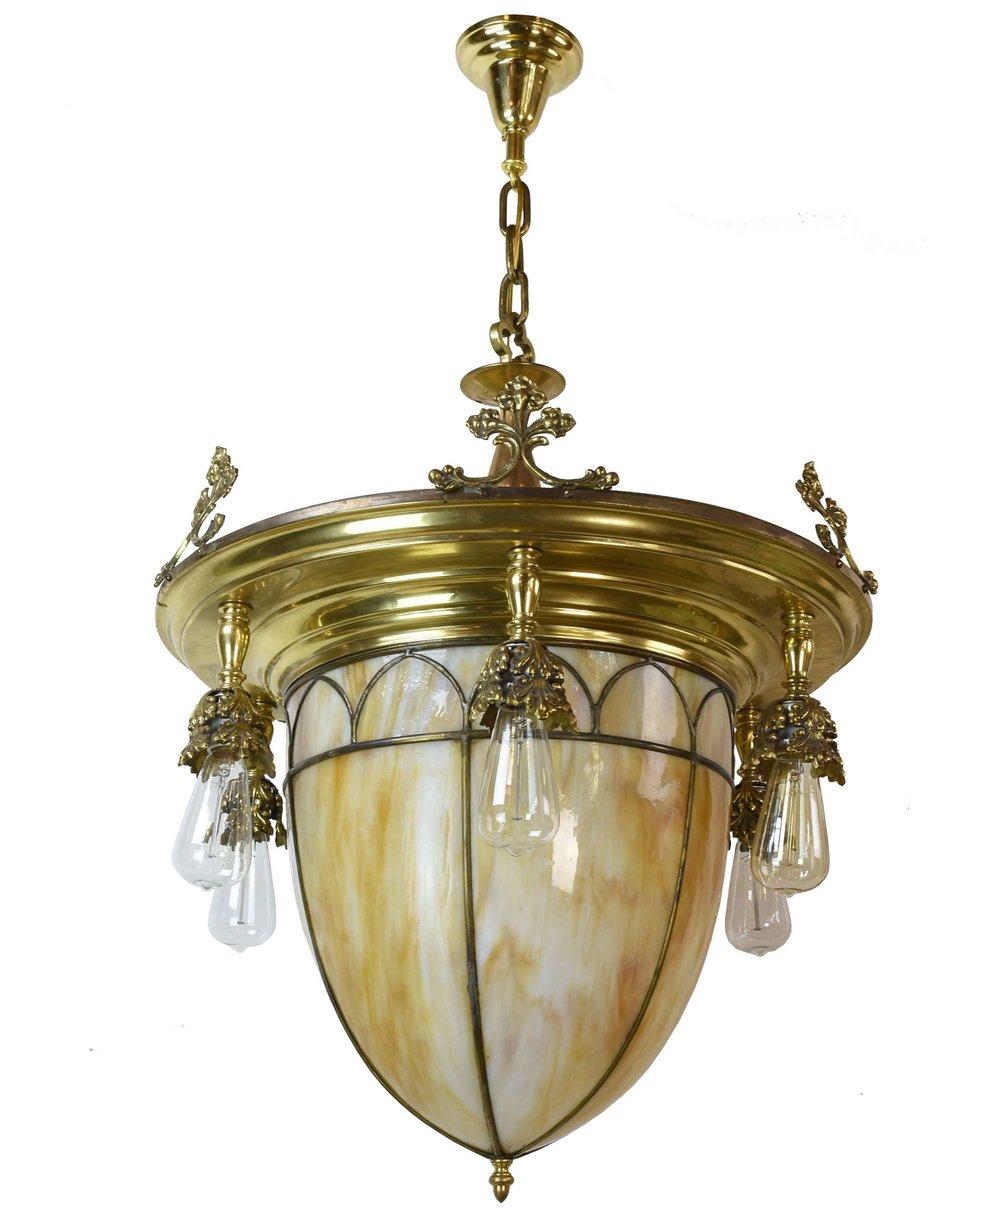 46609-6-light-brass-chandalier-with-slag-glass-shade-bulb-whole.jpg